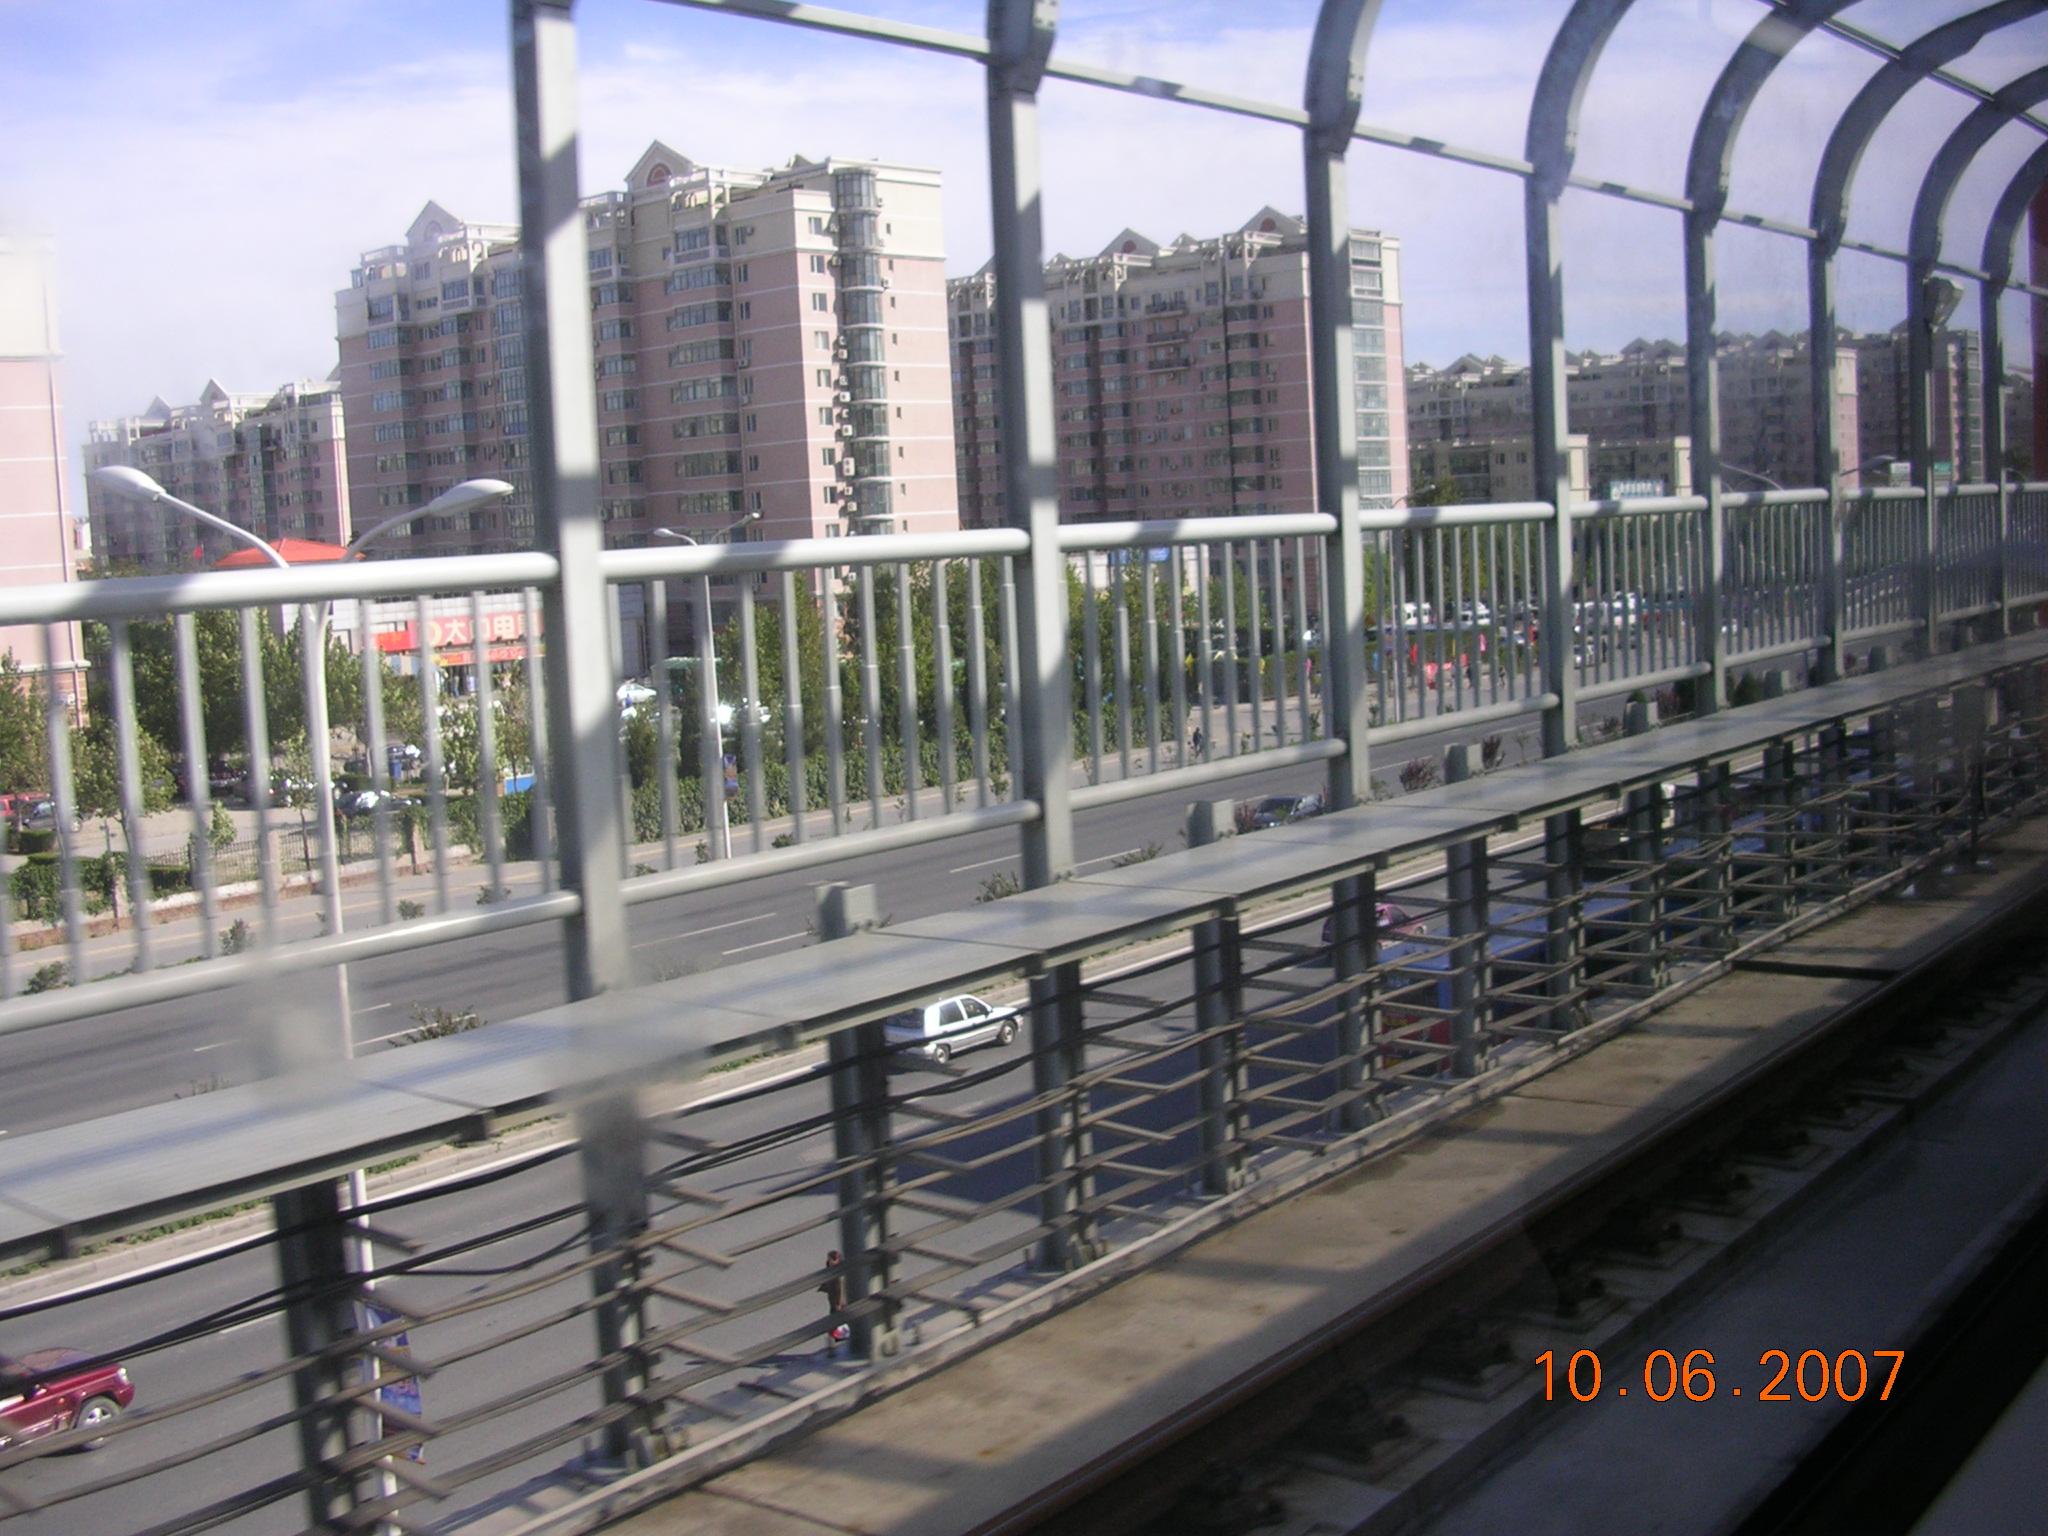 2007-10-07A 038.jpg